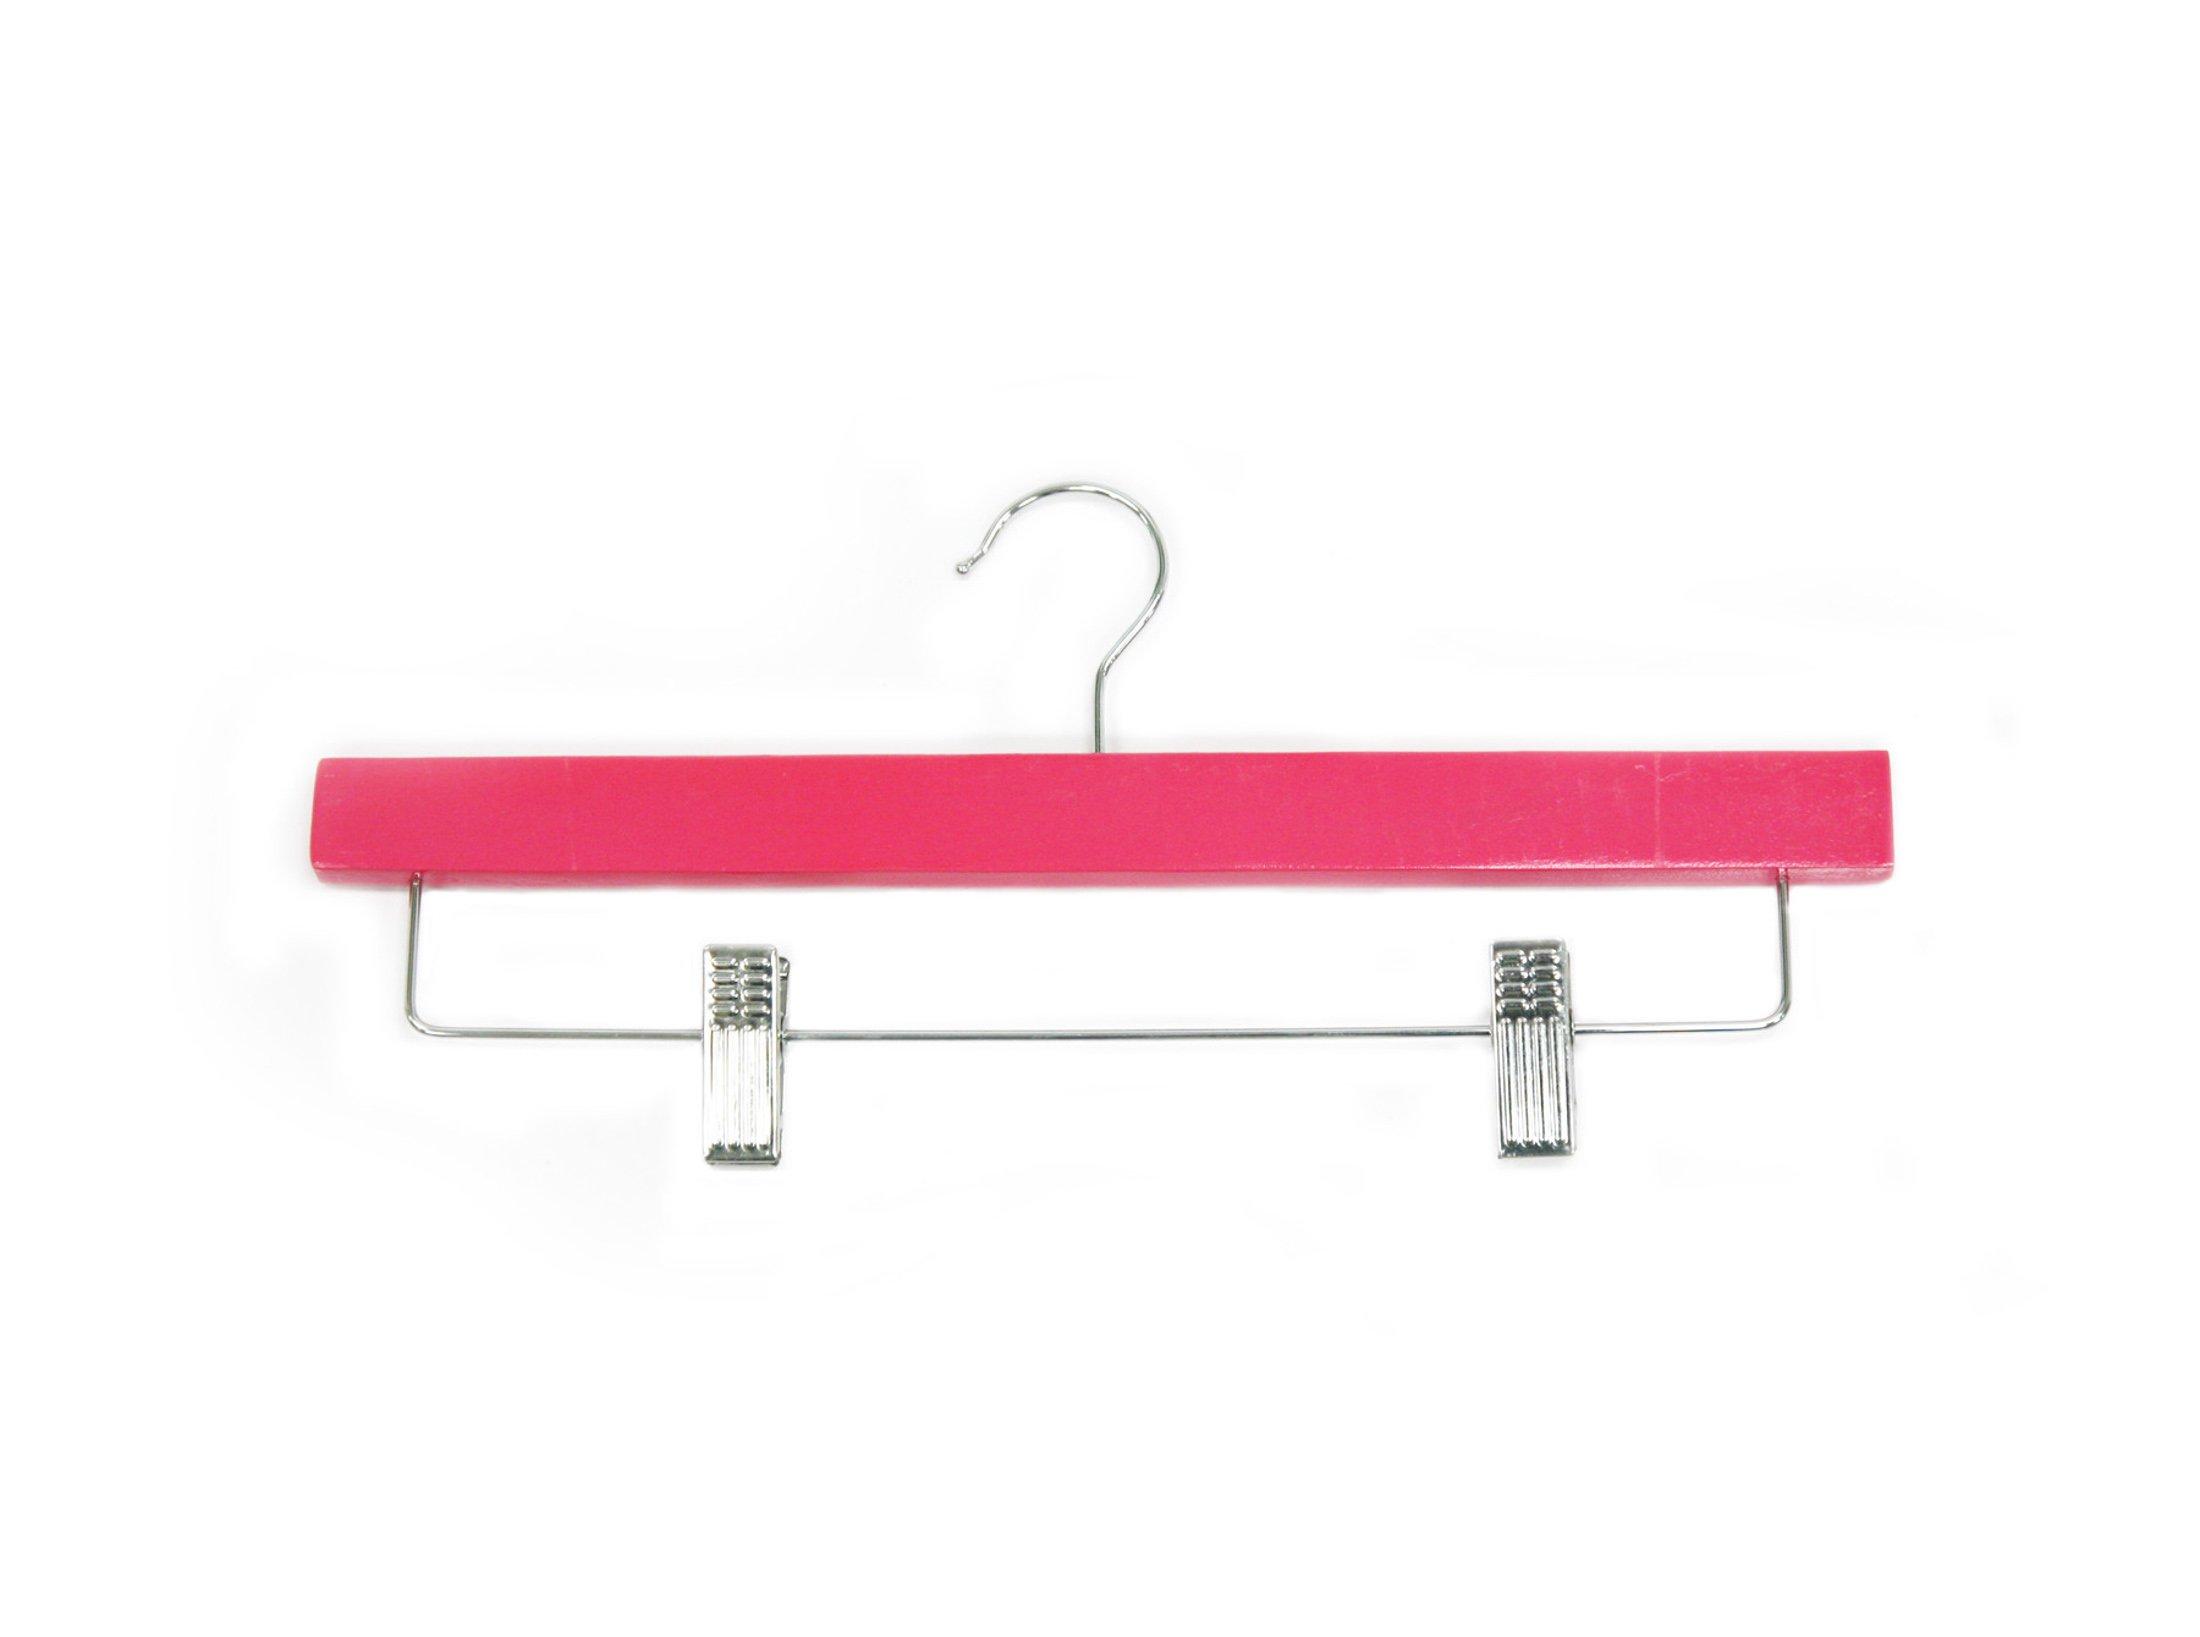 Newtech Display HWB-14/HTPNK Pants/Skirt Wood Hanger, Hot Pink (Pack of 100)